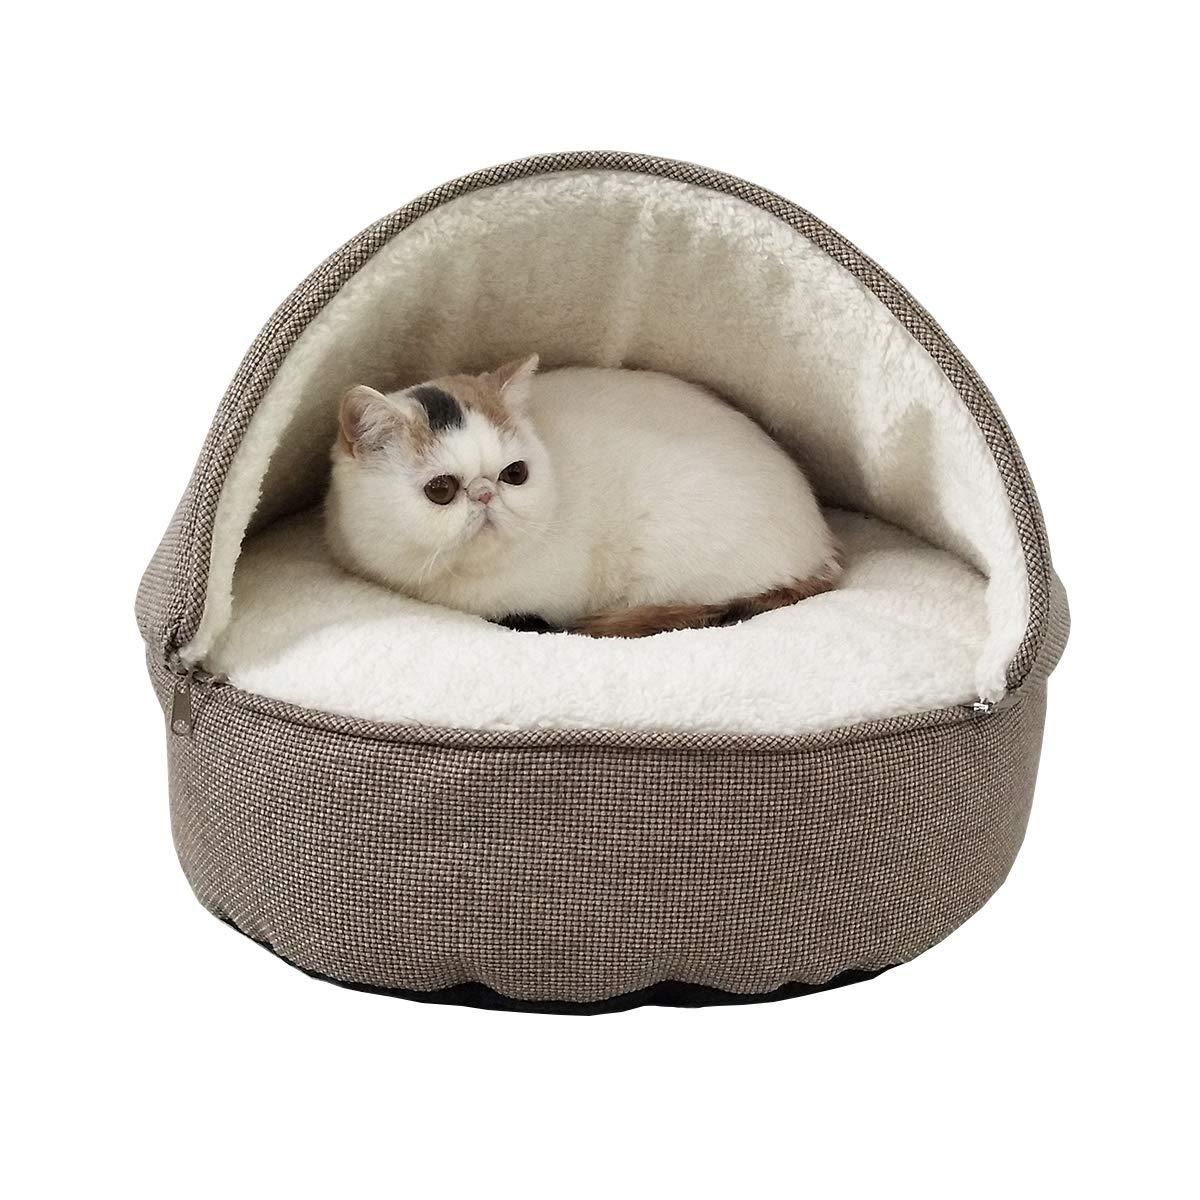 Khaki Medium Khaki Medium ACMEDE Pets House Cave Shape Pet Beds Cats Washable Pet Bed Mat (Medium, Khaki)